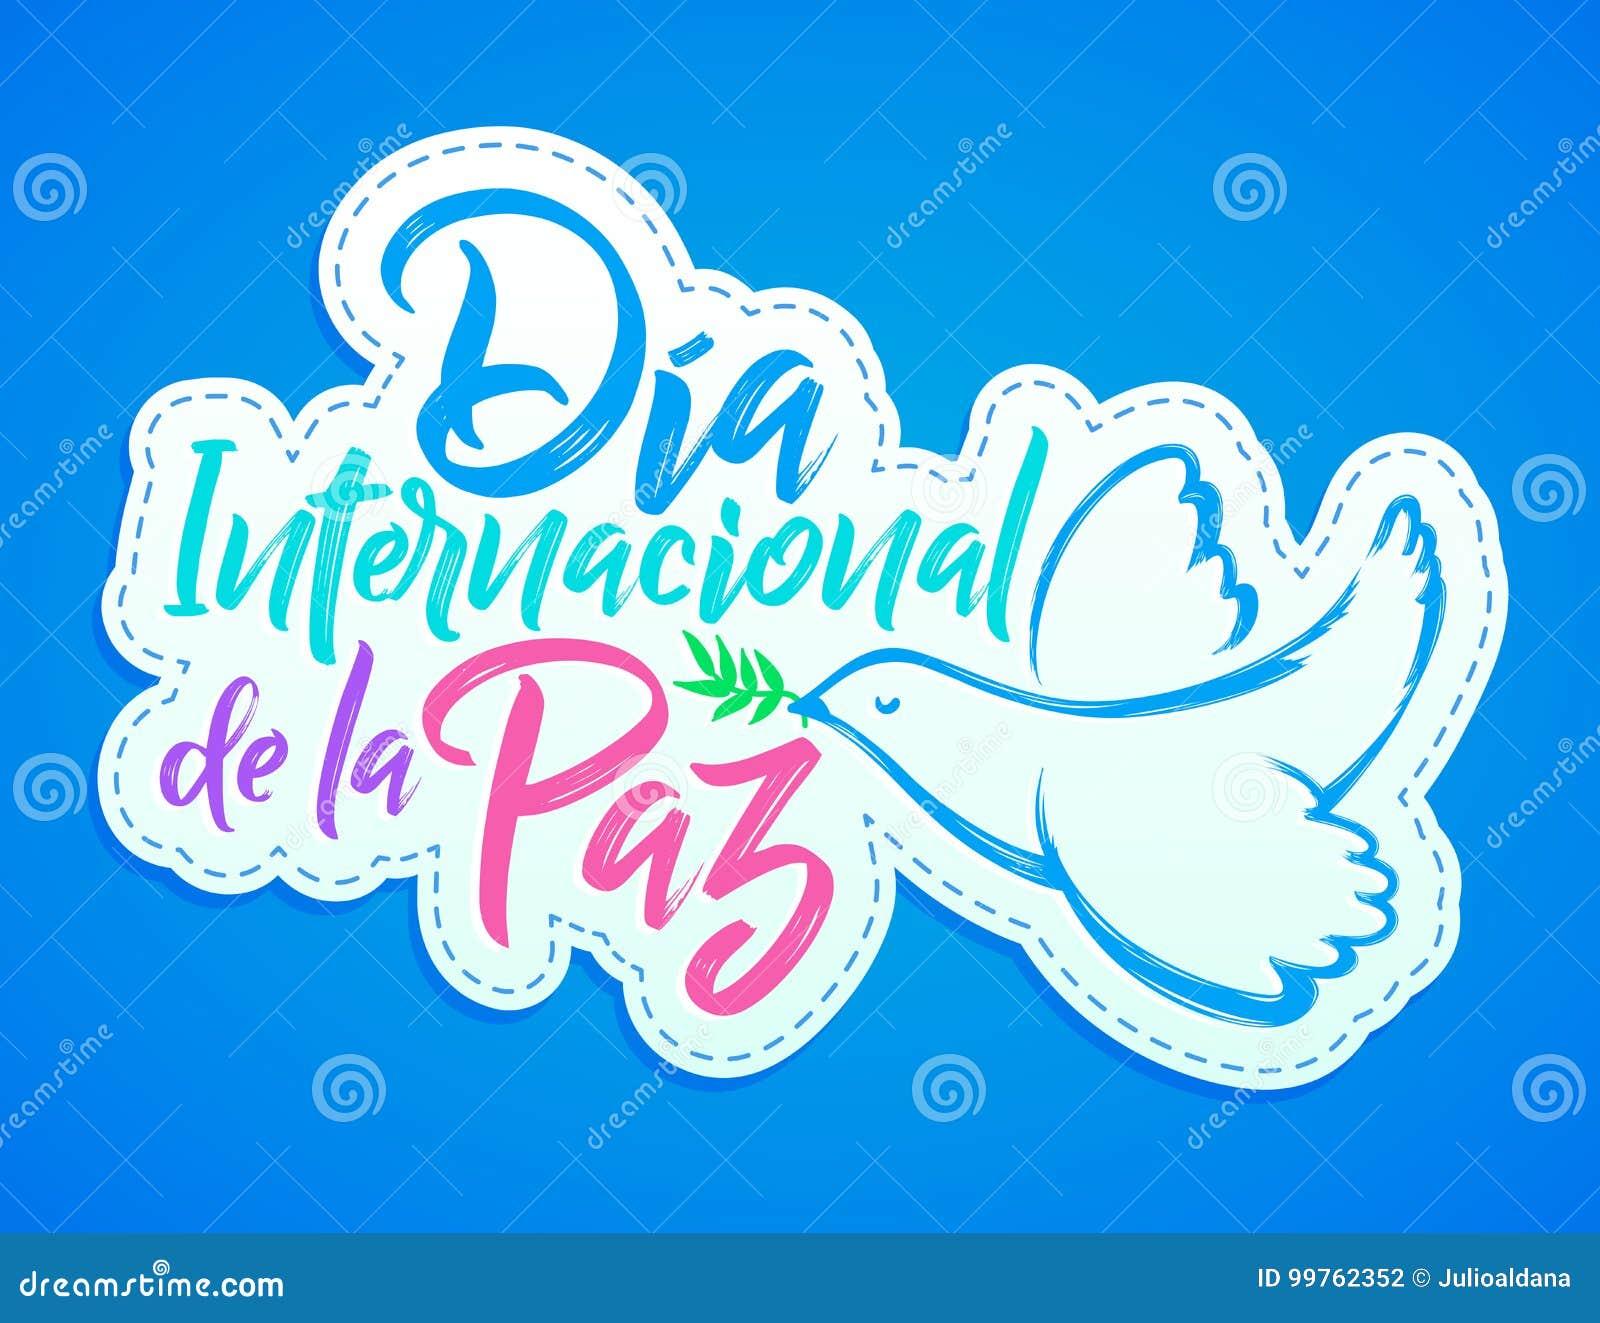 Durchmesser Internacional De La Paz Internationaler Tag Des